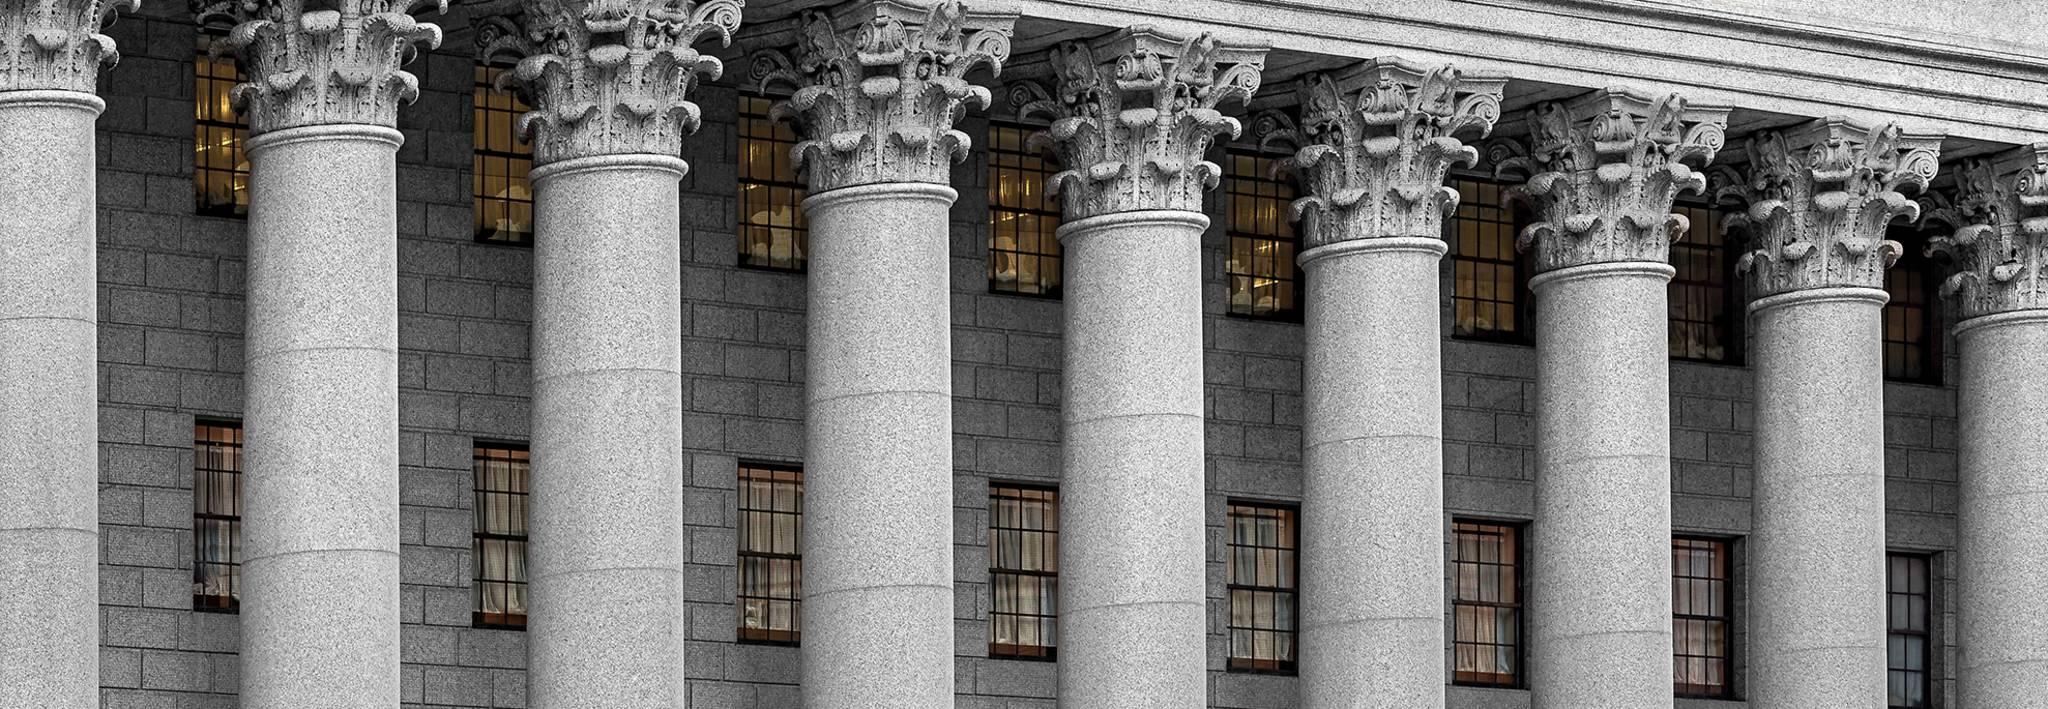 Courthouse pillars.